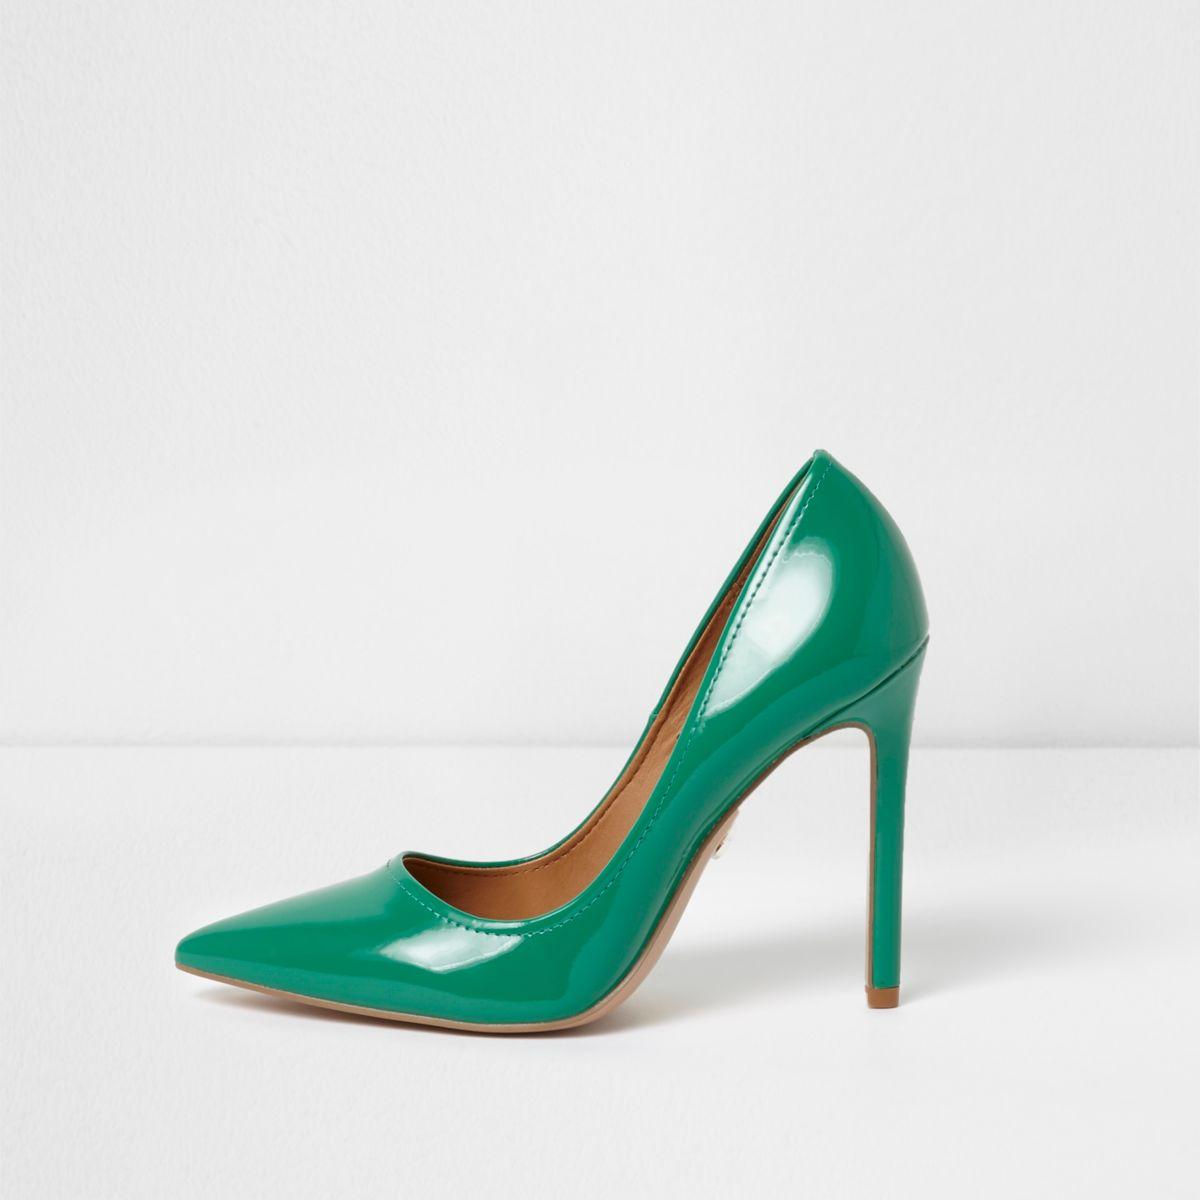 Green patent pumps